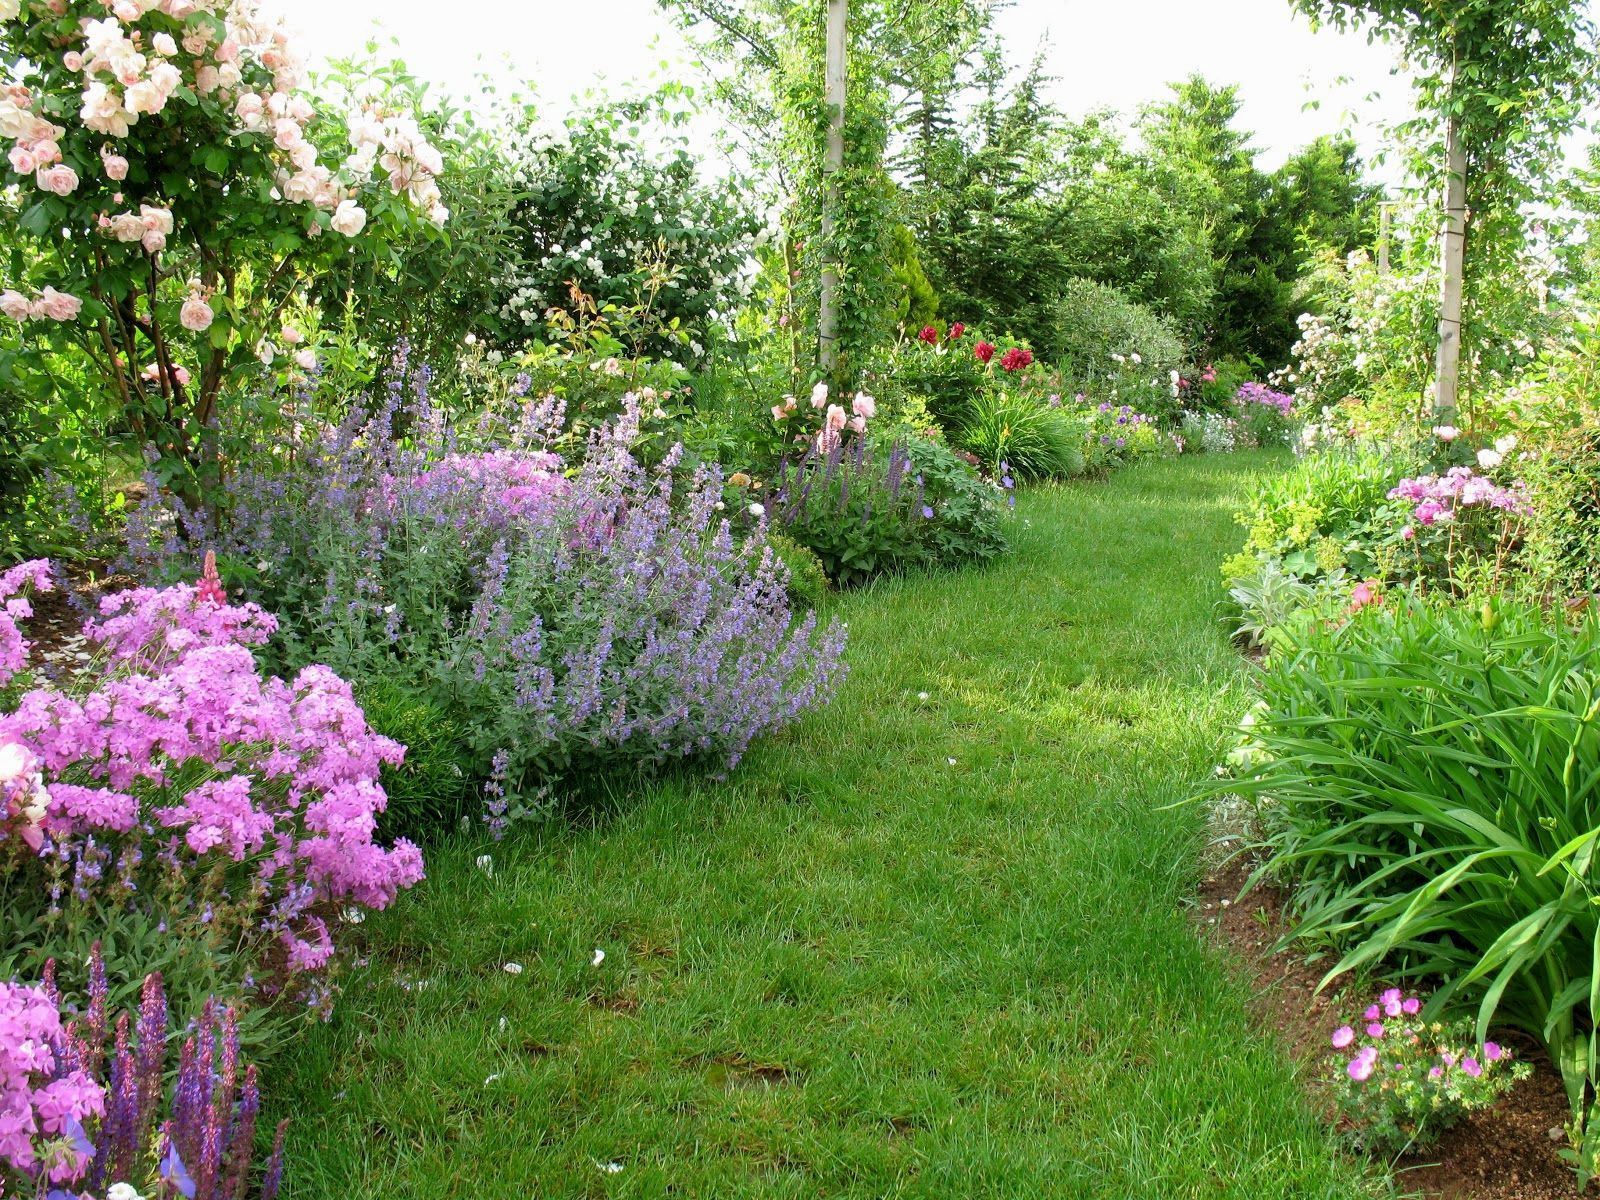 Country Garden Wallpapers Top Free Country Garden Backgrounds Wallpaperaccess